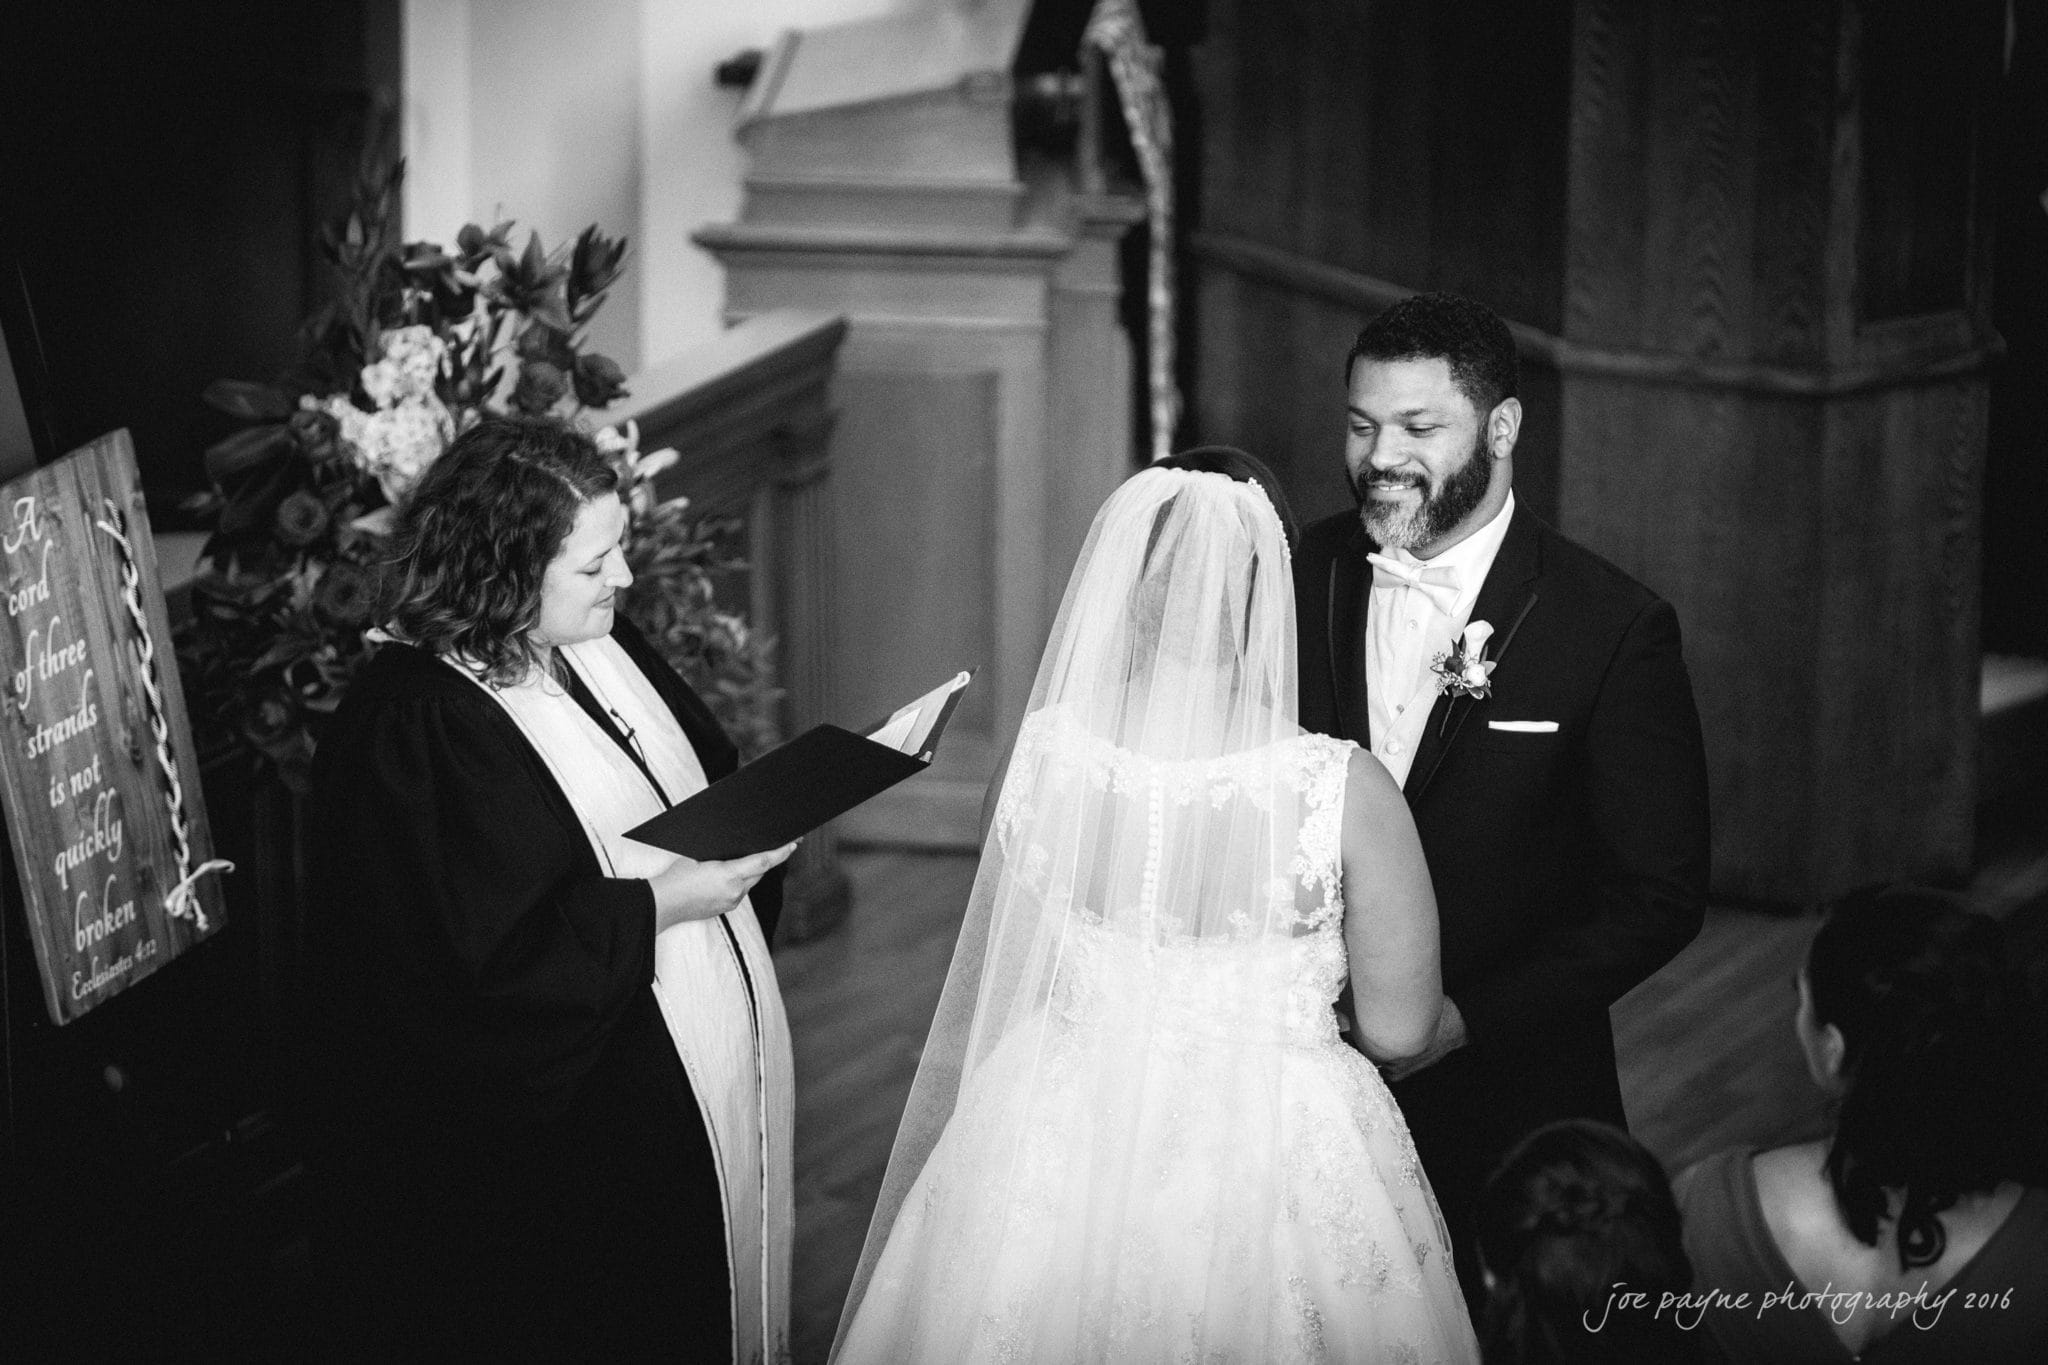 first-baptist-millennium-center-winston-salem-wedding-photography-toni-kevin-24